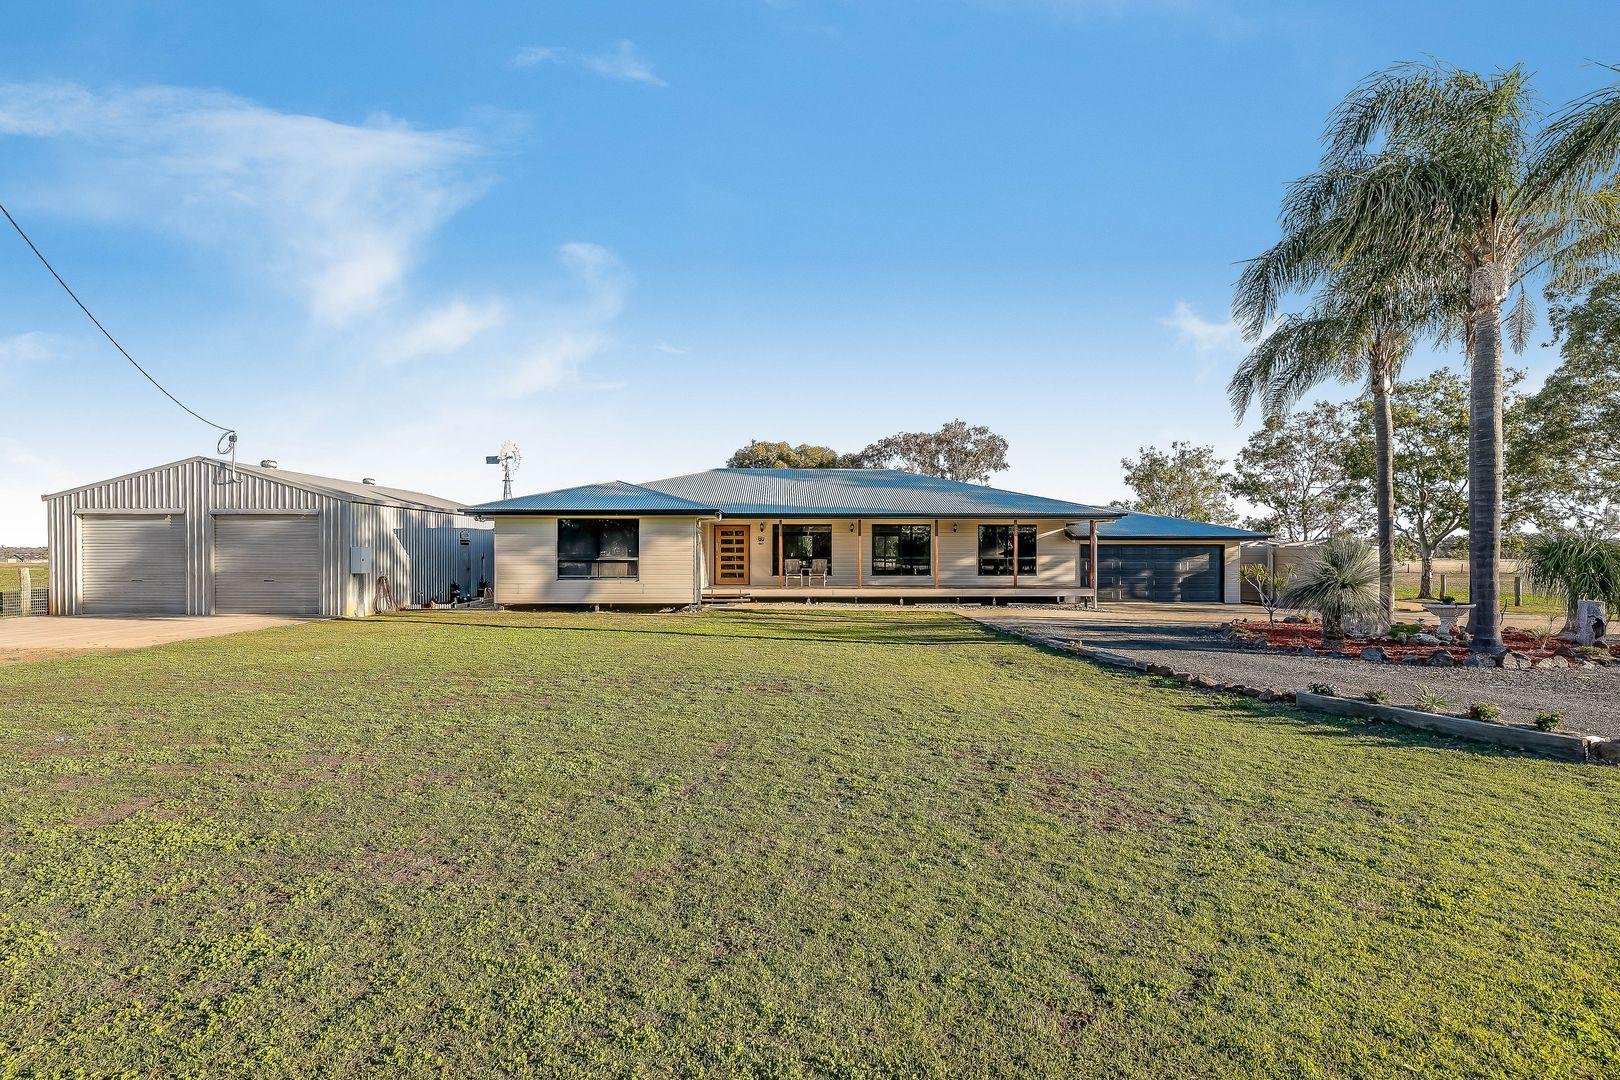 15 Tews Road, Springside, Pittsworth QLD 4356, Image 0